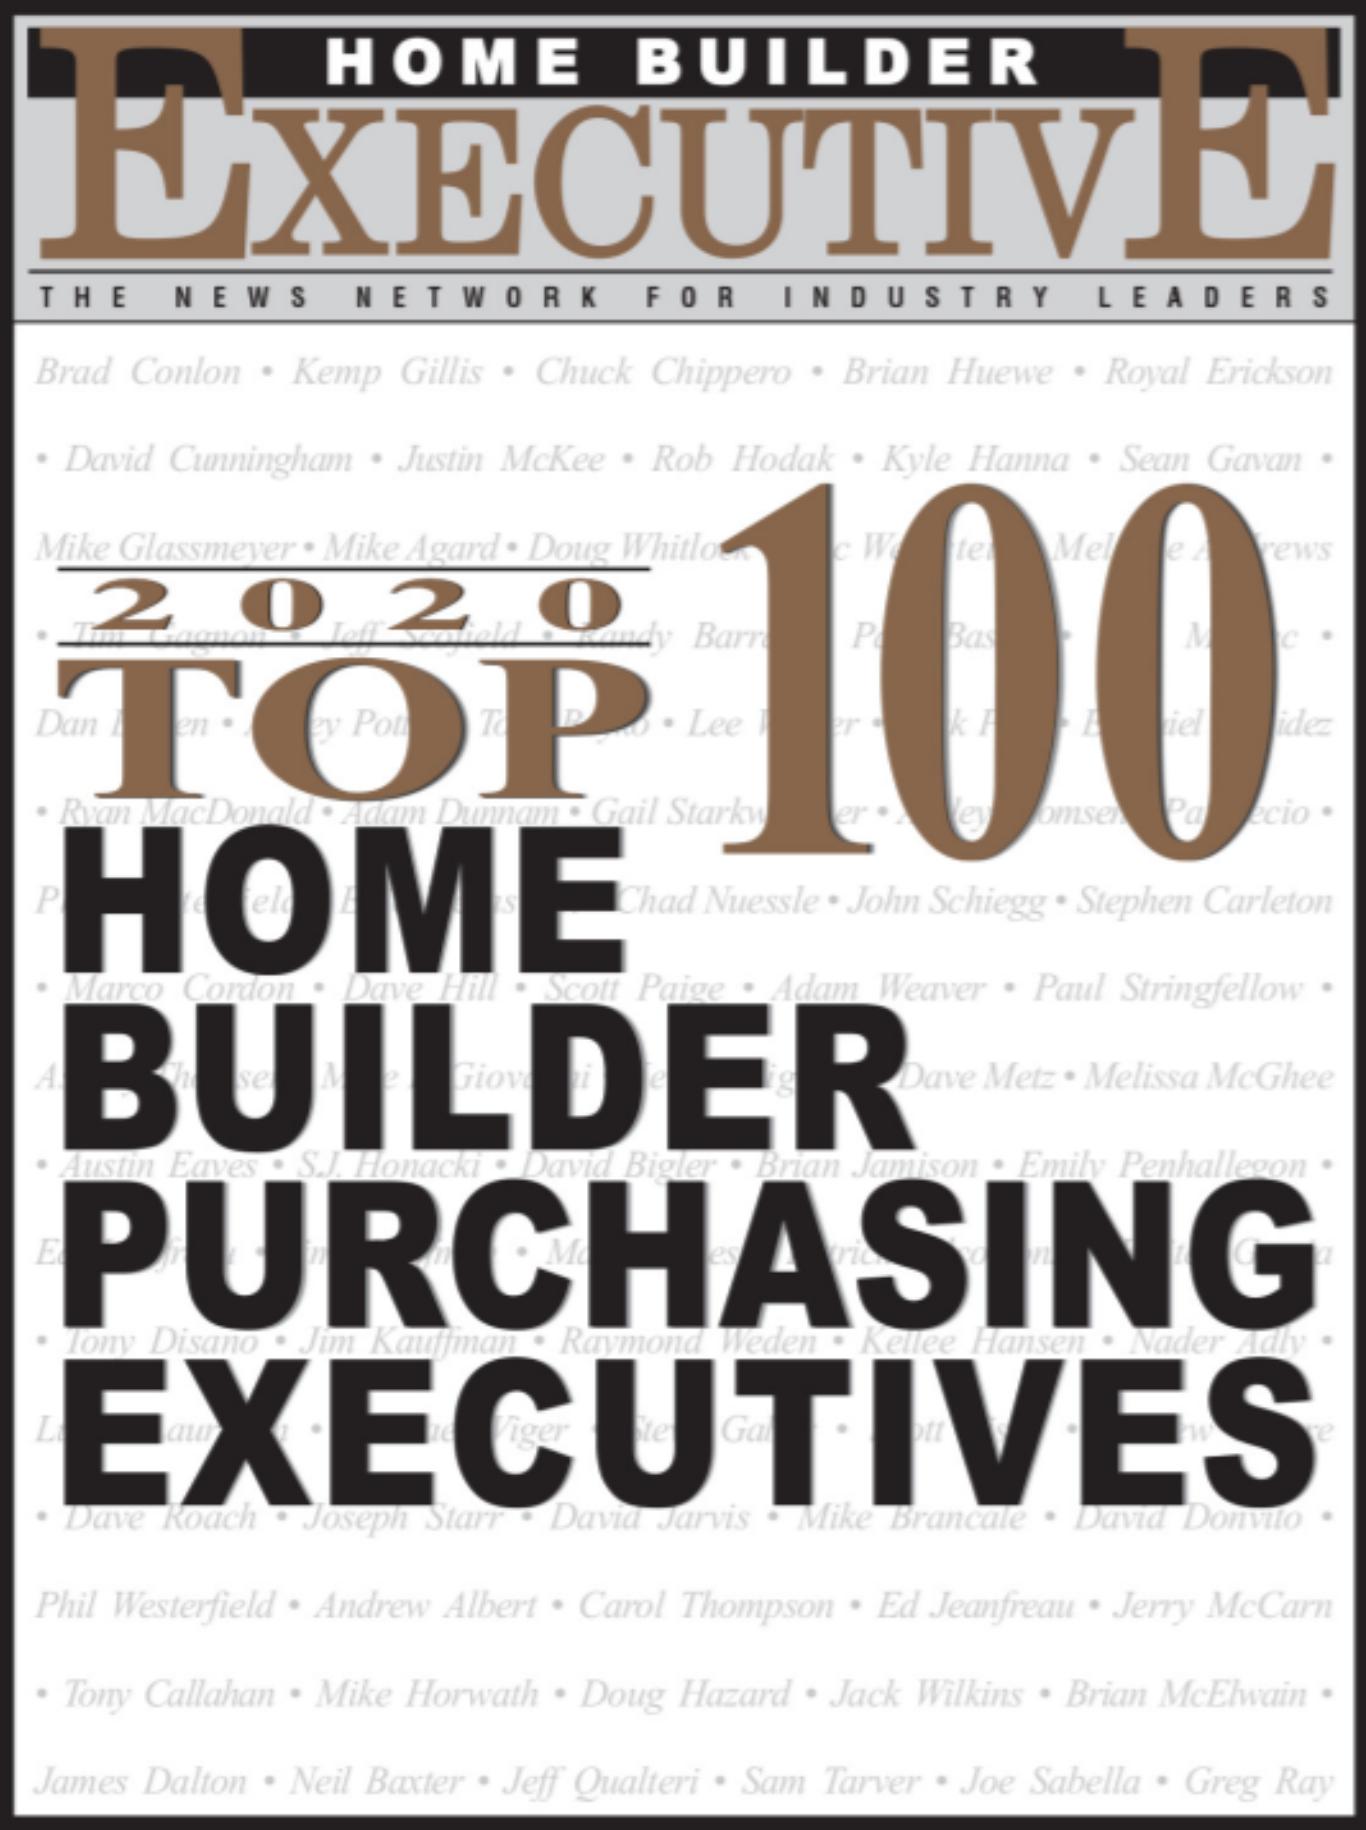 Top 100 Home Builders Publication Kate Boice 2